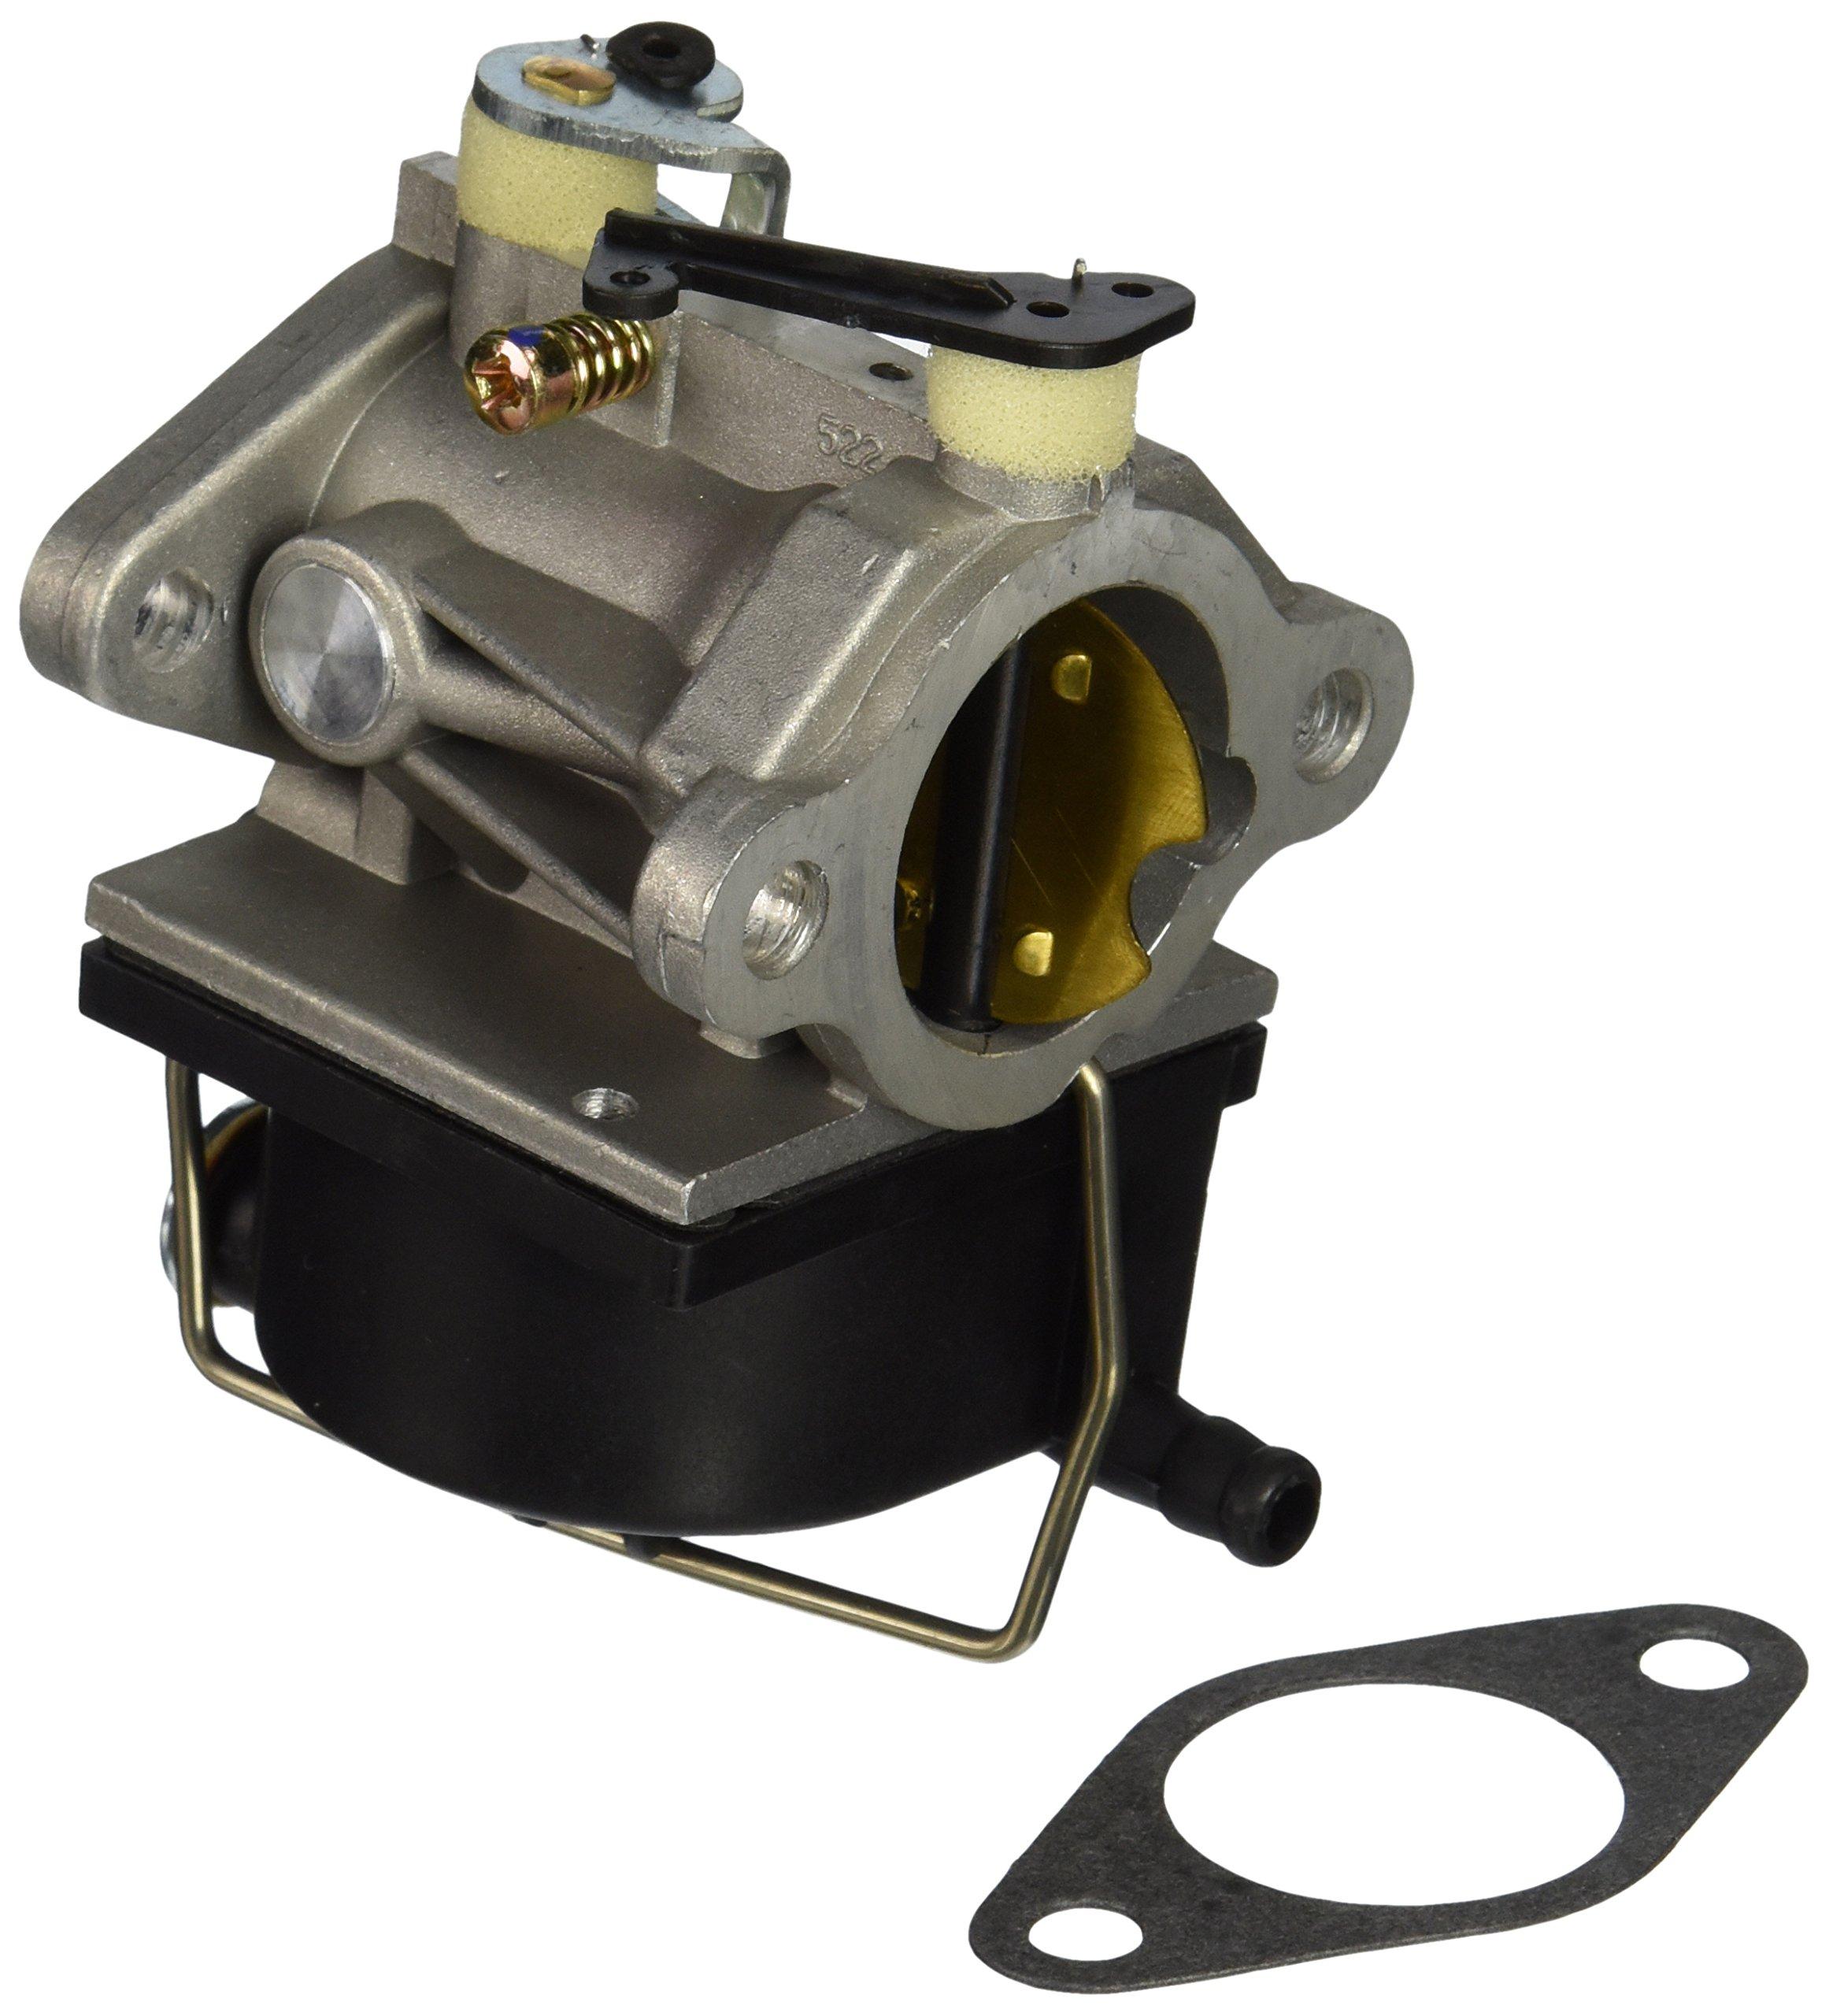 Maxpower 13153 Carburetor Replaces Tecumseh 640065A, 640065